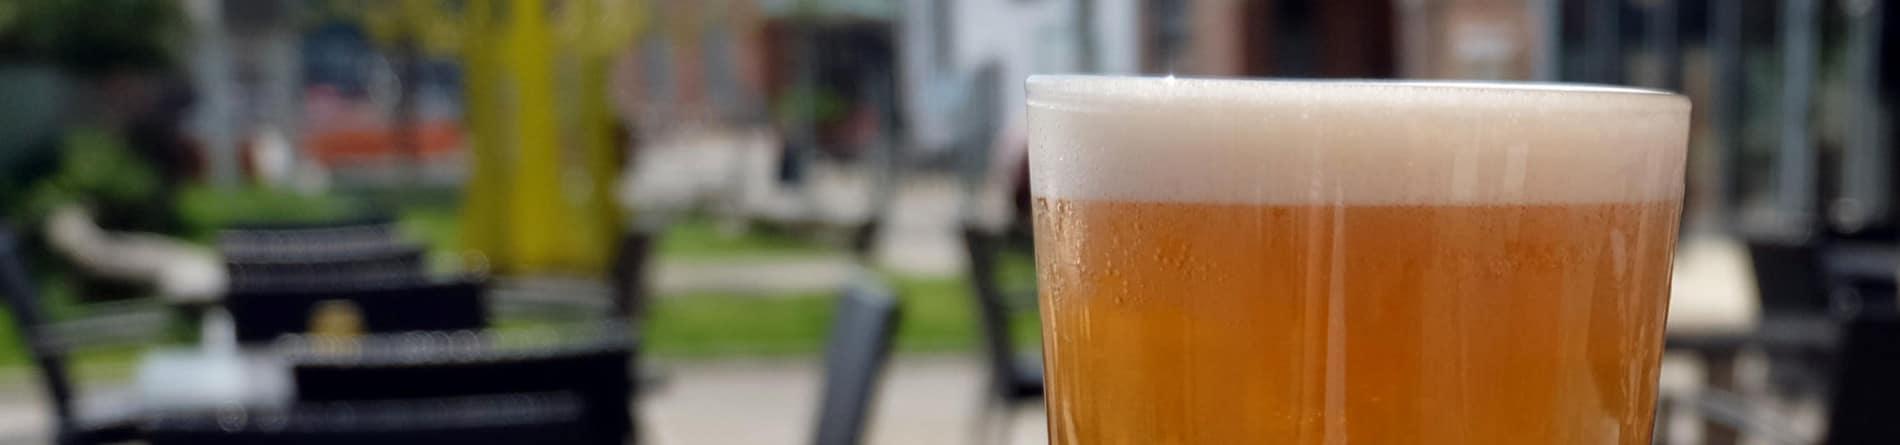 SIBA Beerflex Breweries All FSQ Enrolled